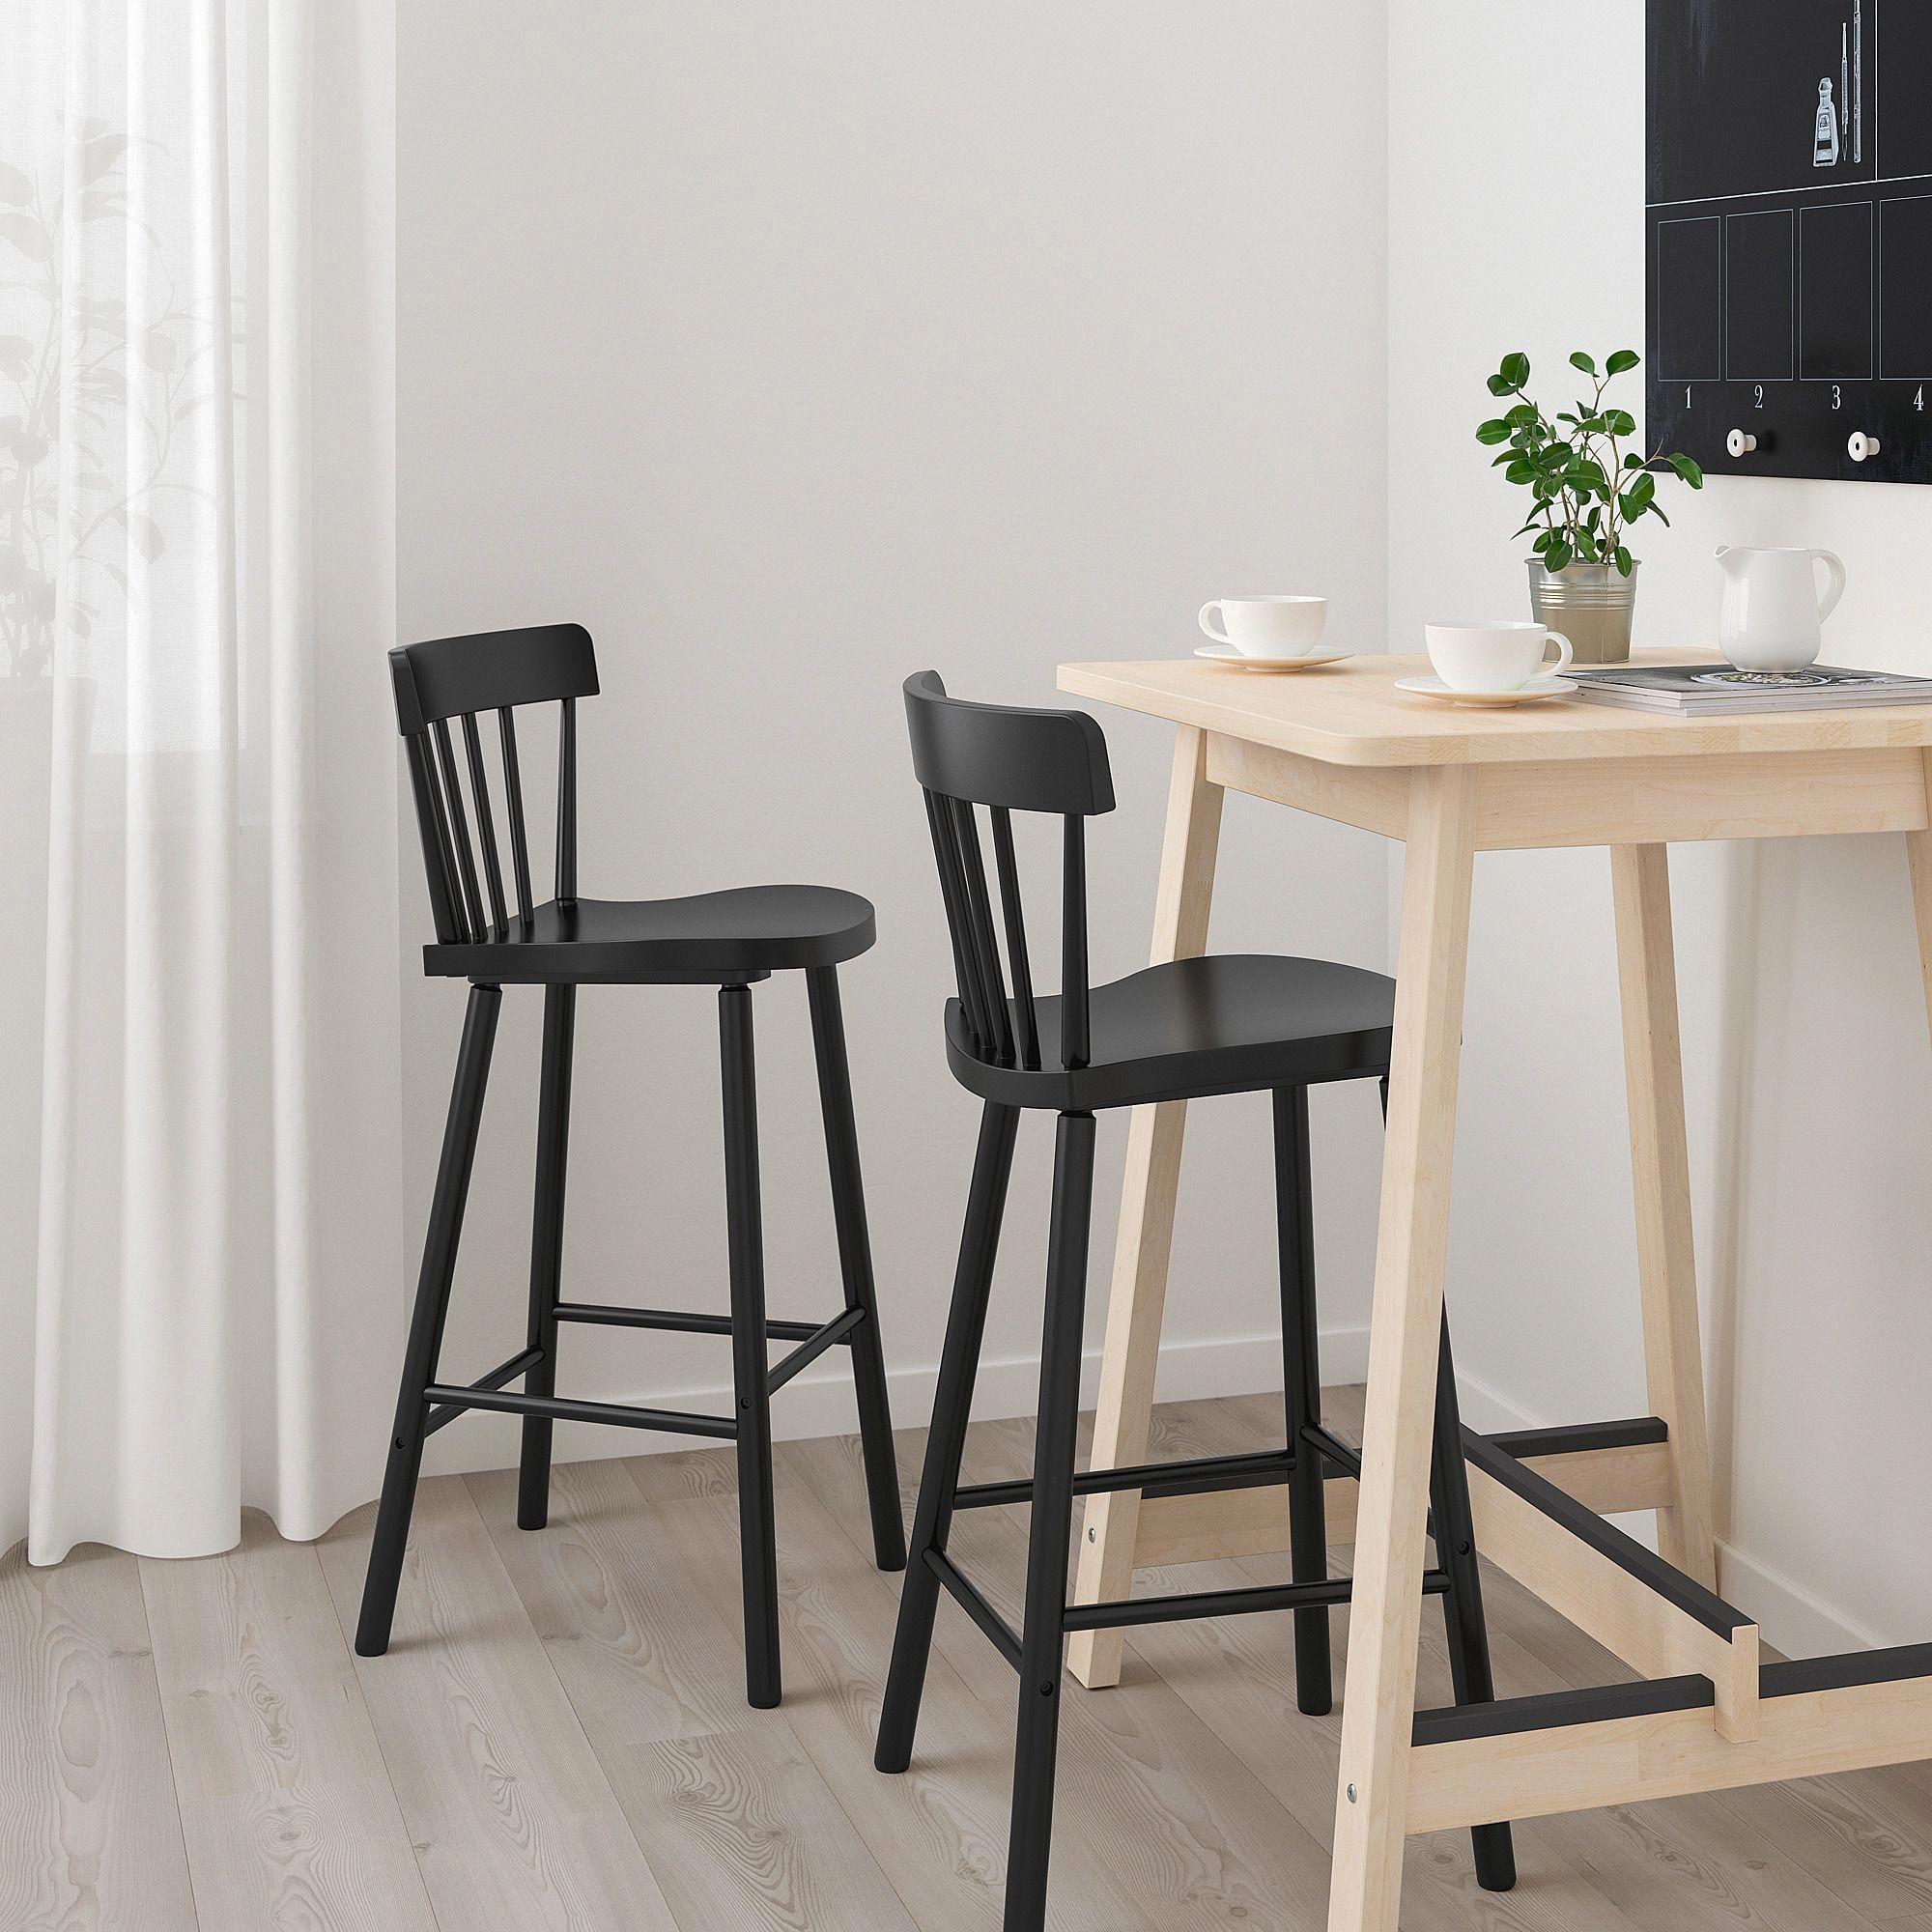 Furniture Home Furnishings Find Your Inspiration Bar Table Ikea Bar Bar Stools